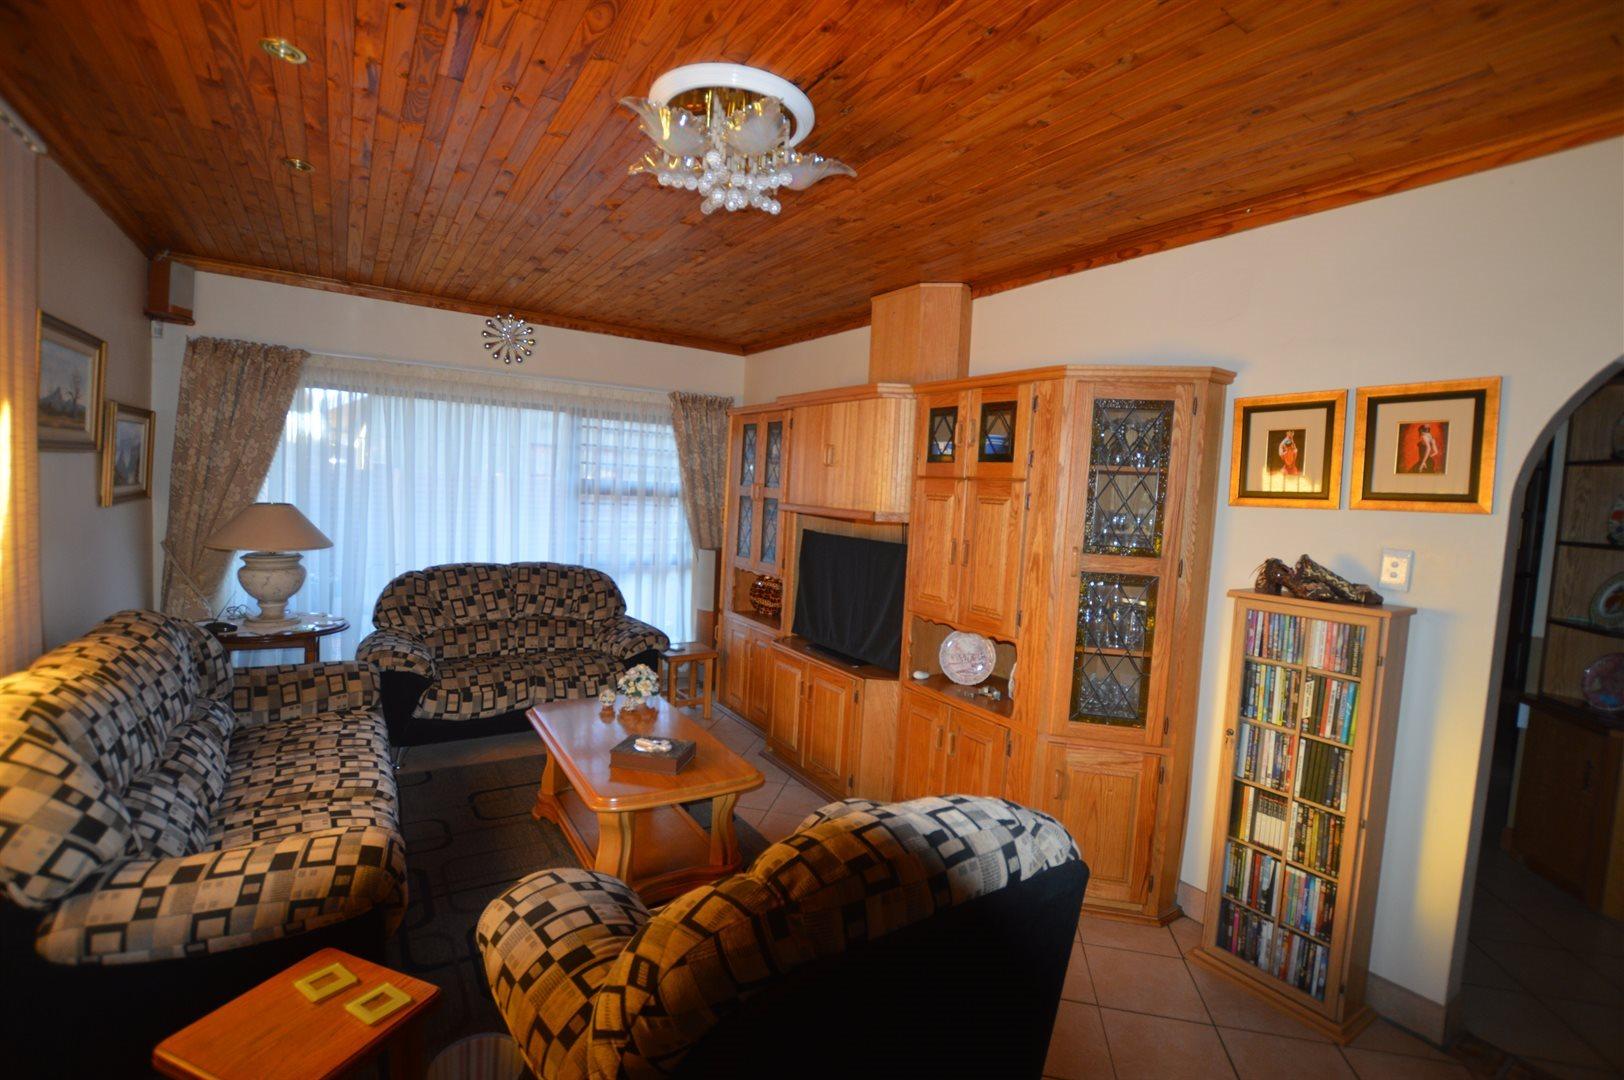 Vanderbijlpark Se6 property for sale. Ref No: 13523020. Picture no 5